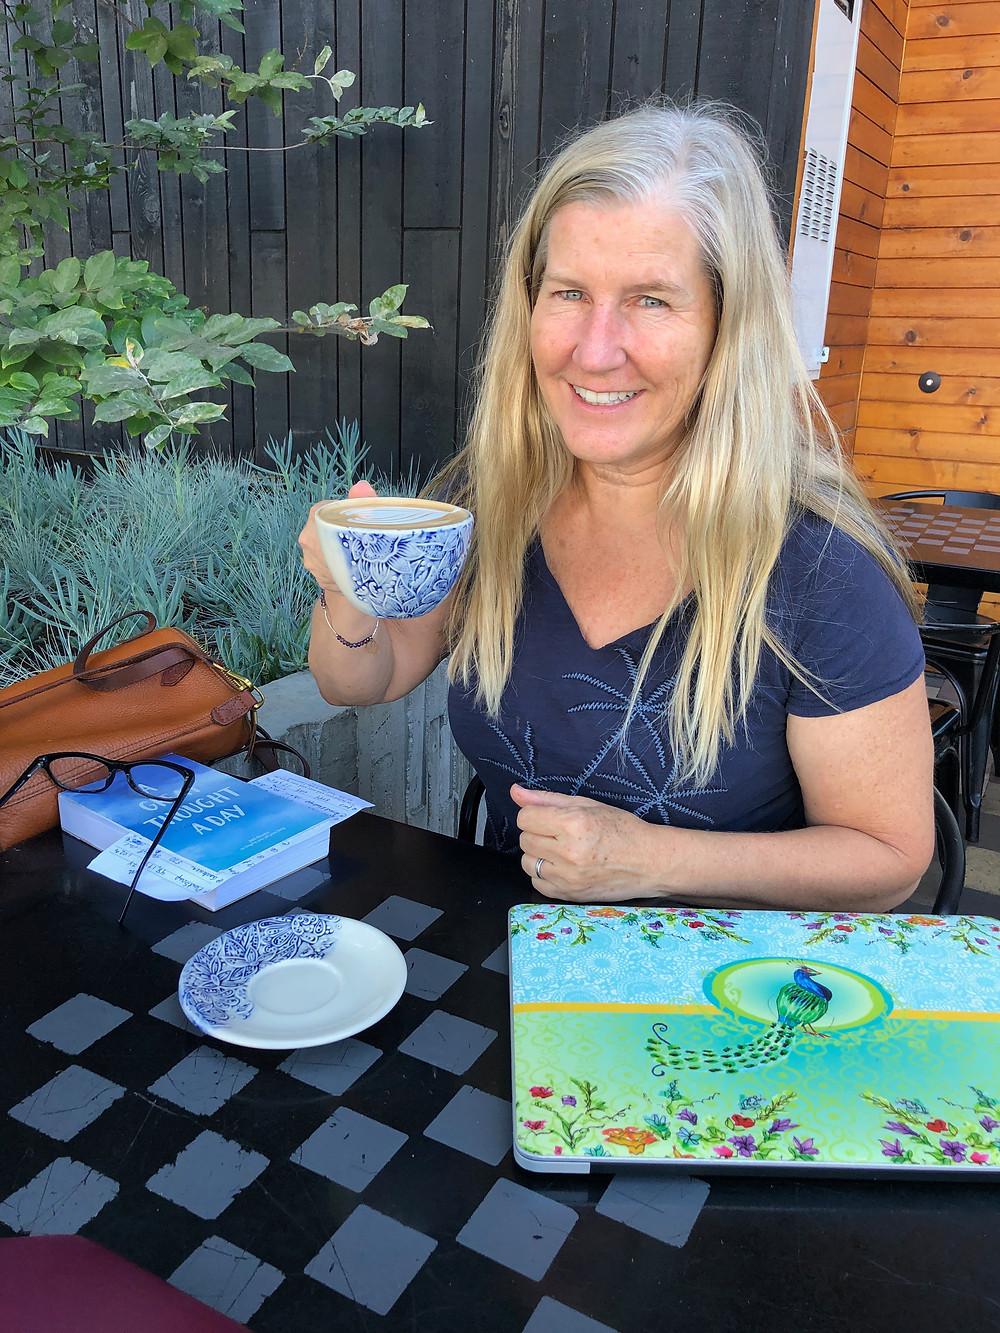 Siri Kay Jostad of Wander Away with Siri Kay sipping coffee at James Coffee in Bankers Hill San Diego California